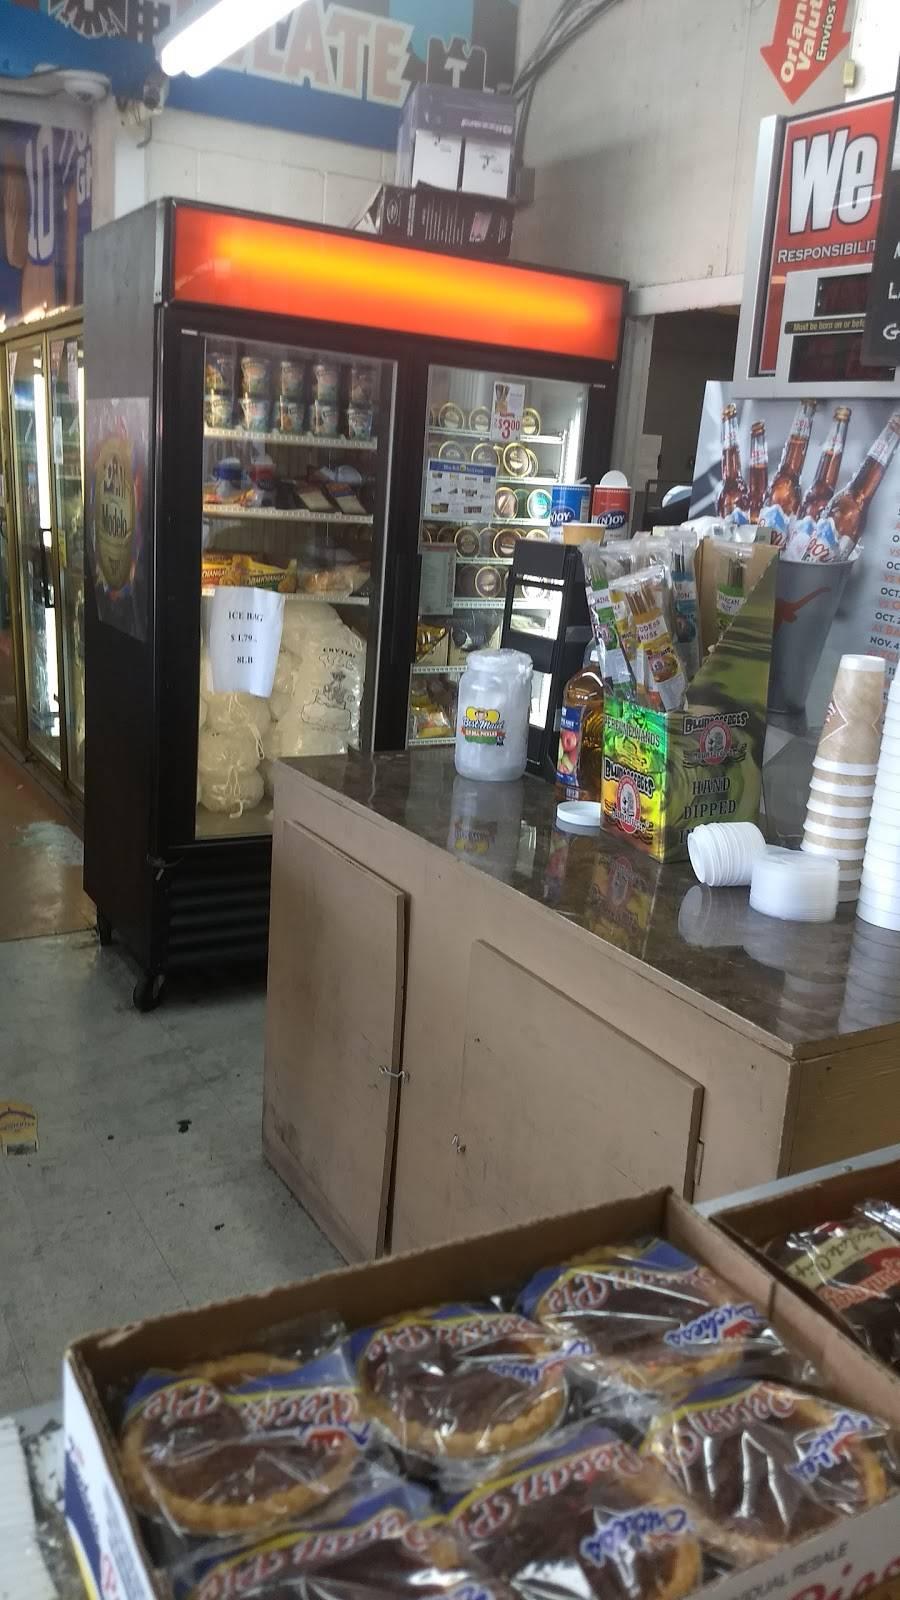 Graboost   restaurant   4611 E Martin Luther King Jr Blvd, Austin, TX 78721, USA   5129269553 OR +1 512-926-9553